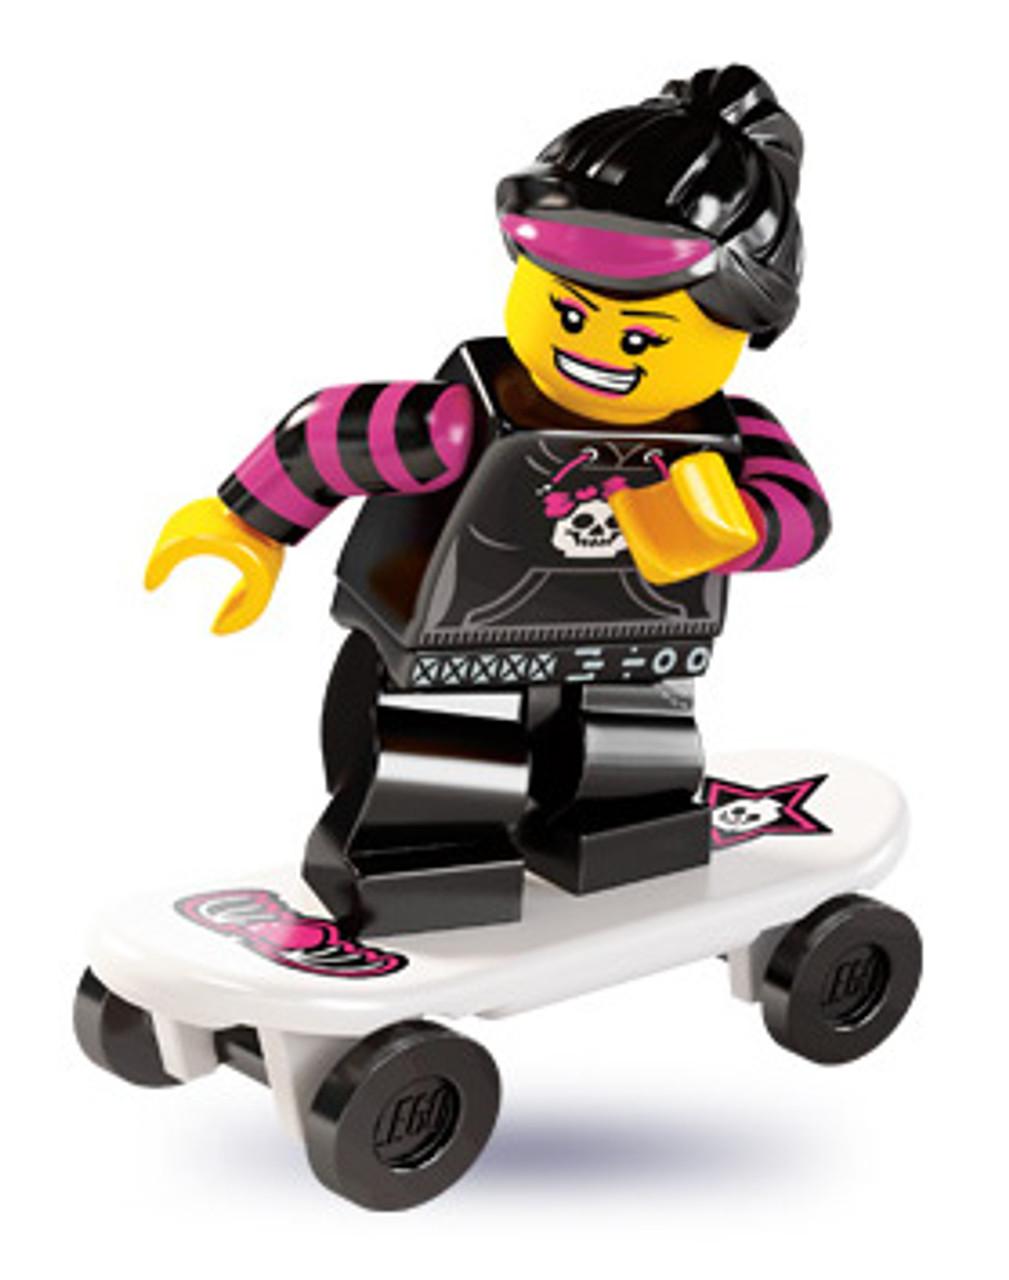 LEGO Minifigures Series 6 Skater Girl Minifigure [Loose]